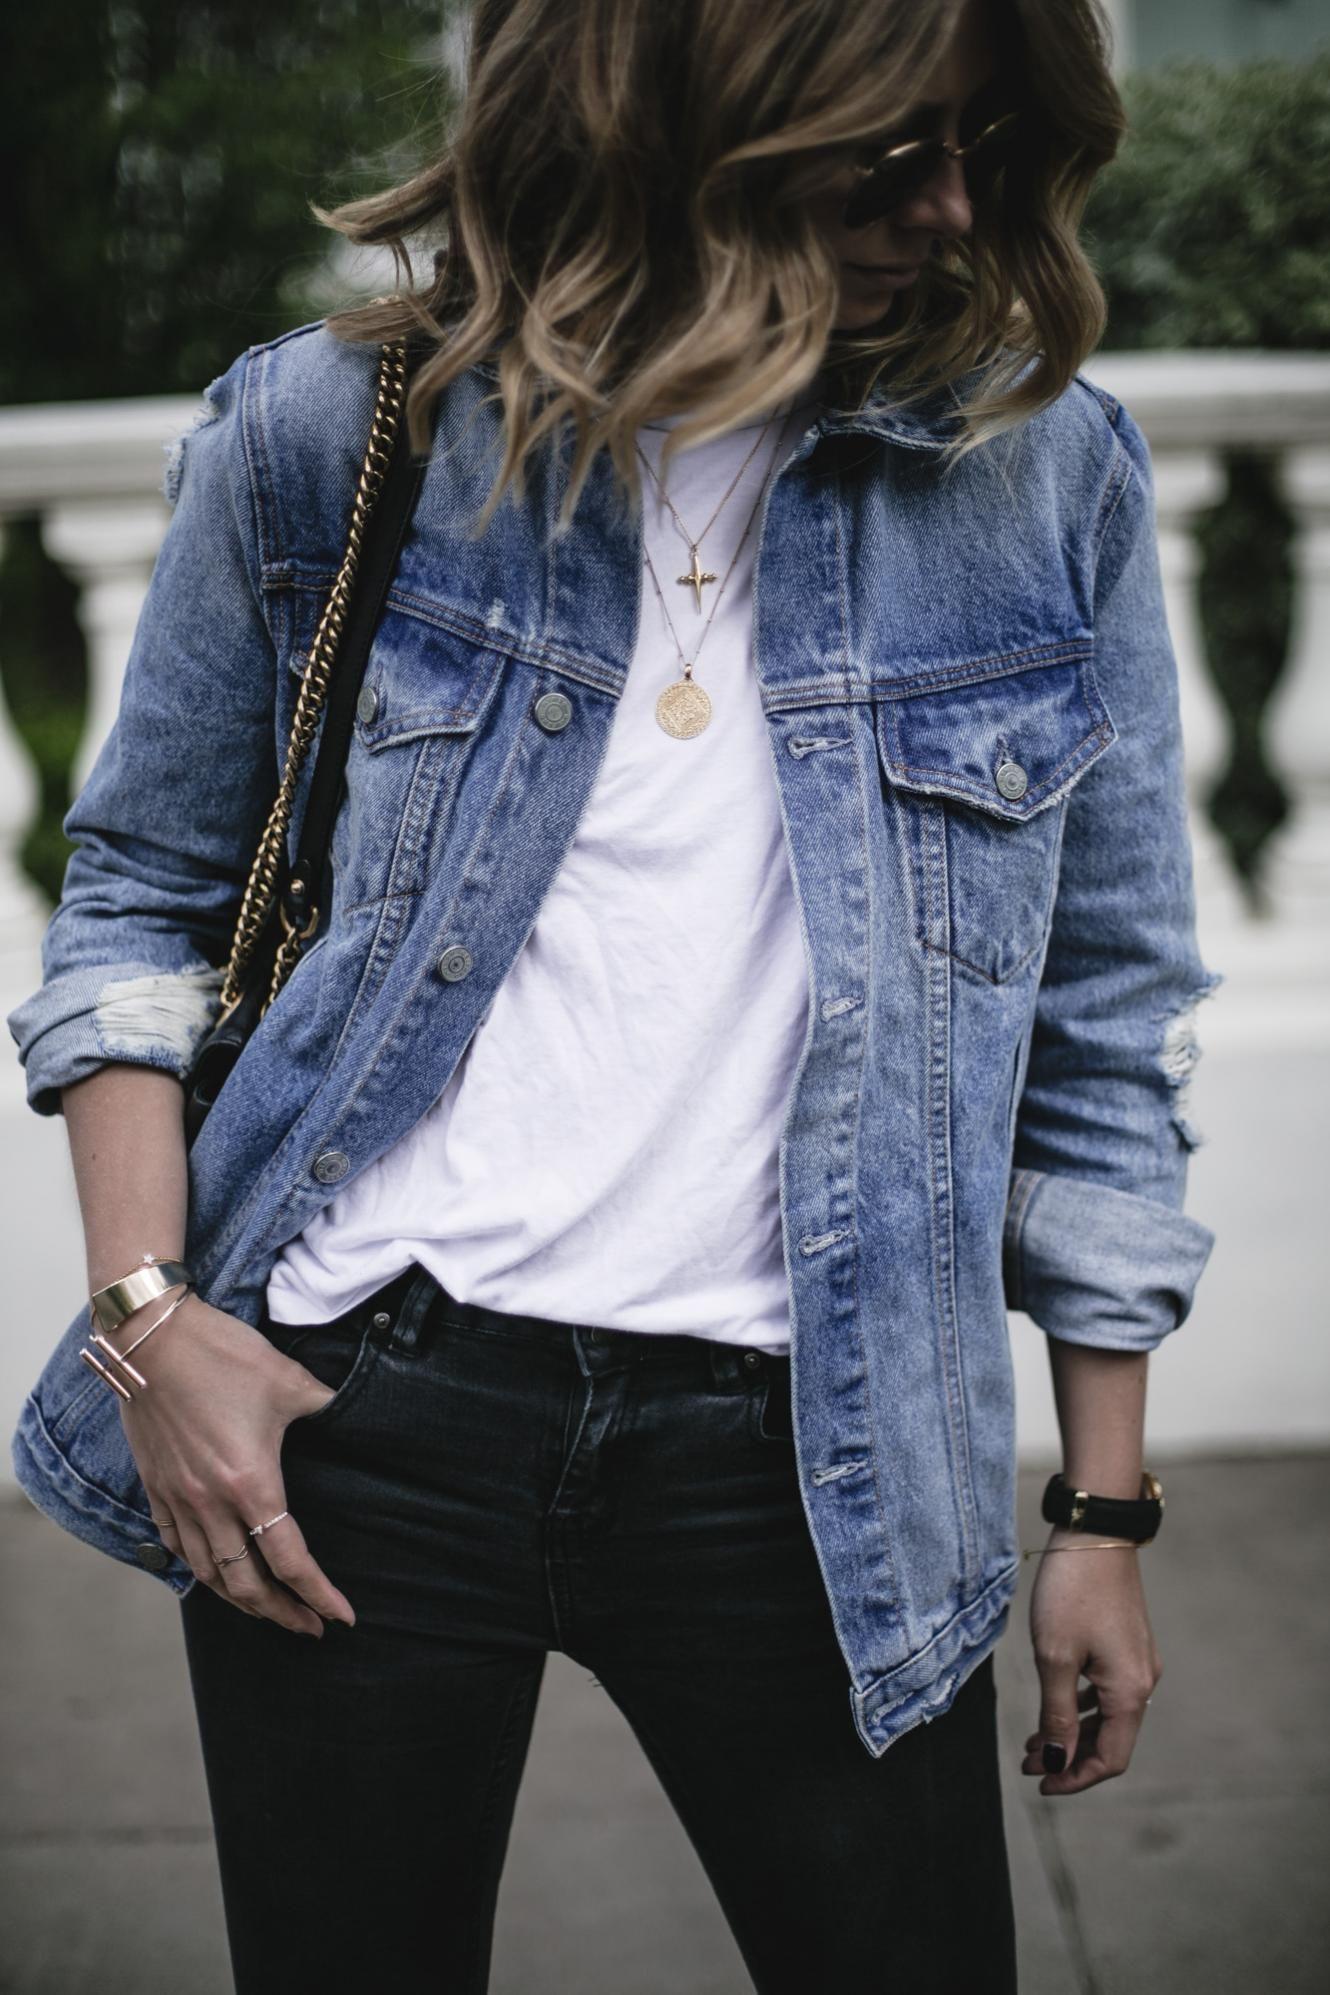 Emma Hill Wears Grlfrnd Oversized Denim Jacket White T Shirt Black Skinny Jeans Gold Jeweller Denim Jacket Outfit Oversized Denim Jacket Jean Jacket Outfits [ 1995 x 1330 Pixel ]